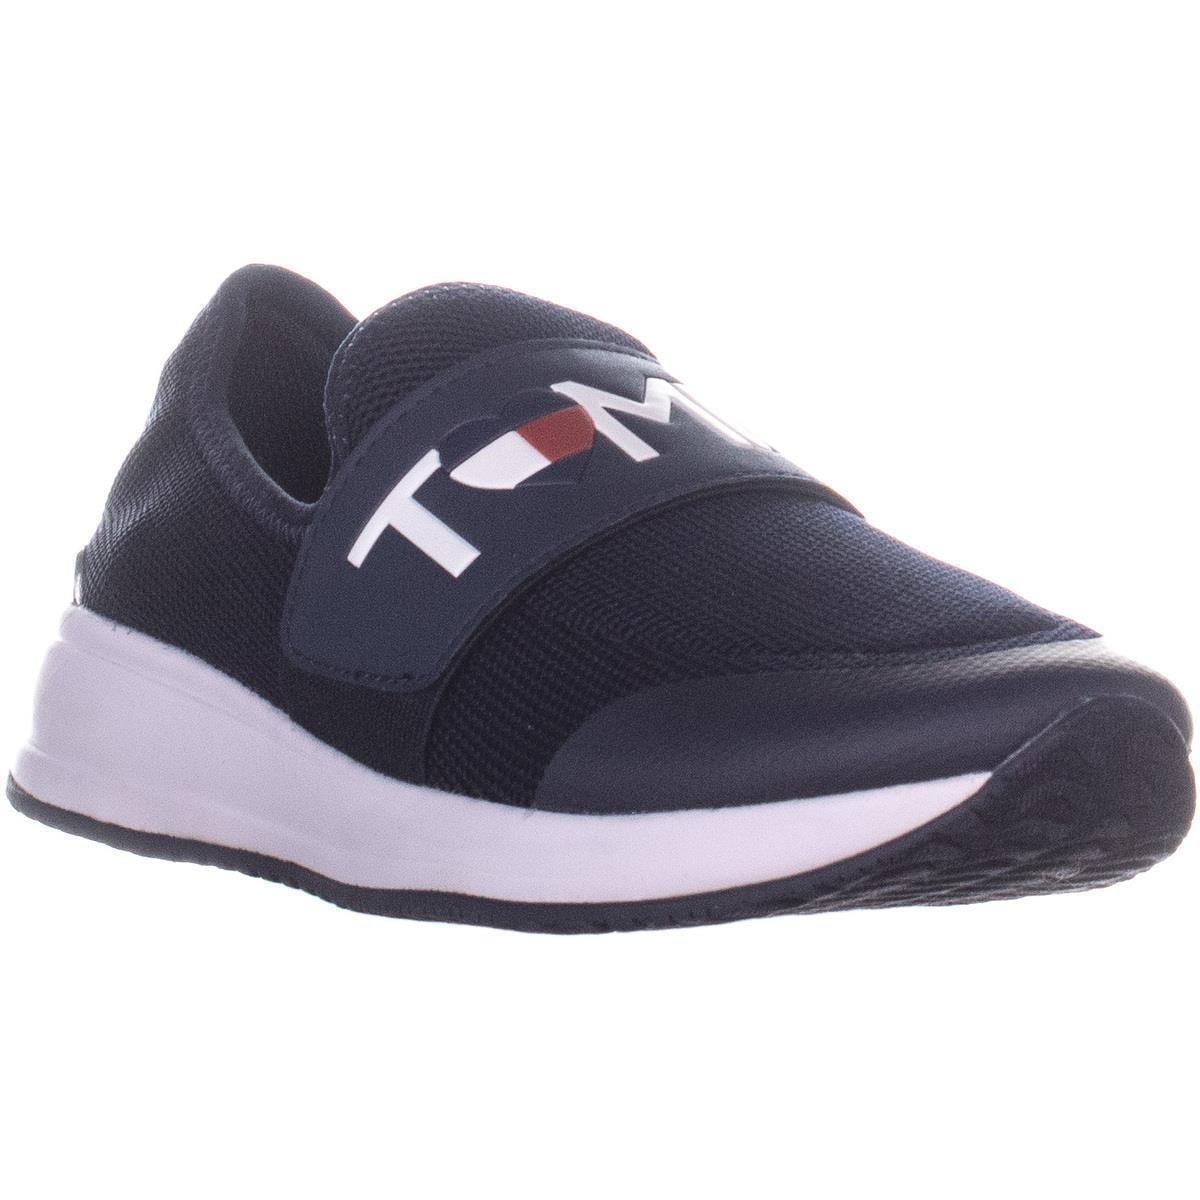 Shop Tommy Hilfiger Rosin Low Top